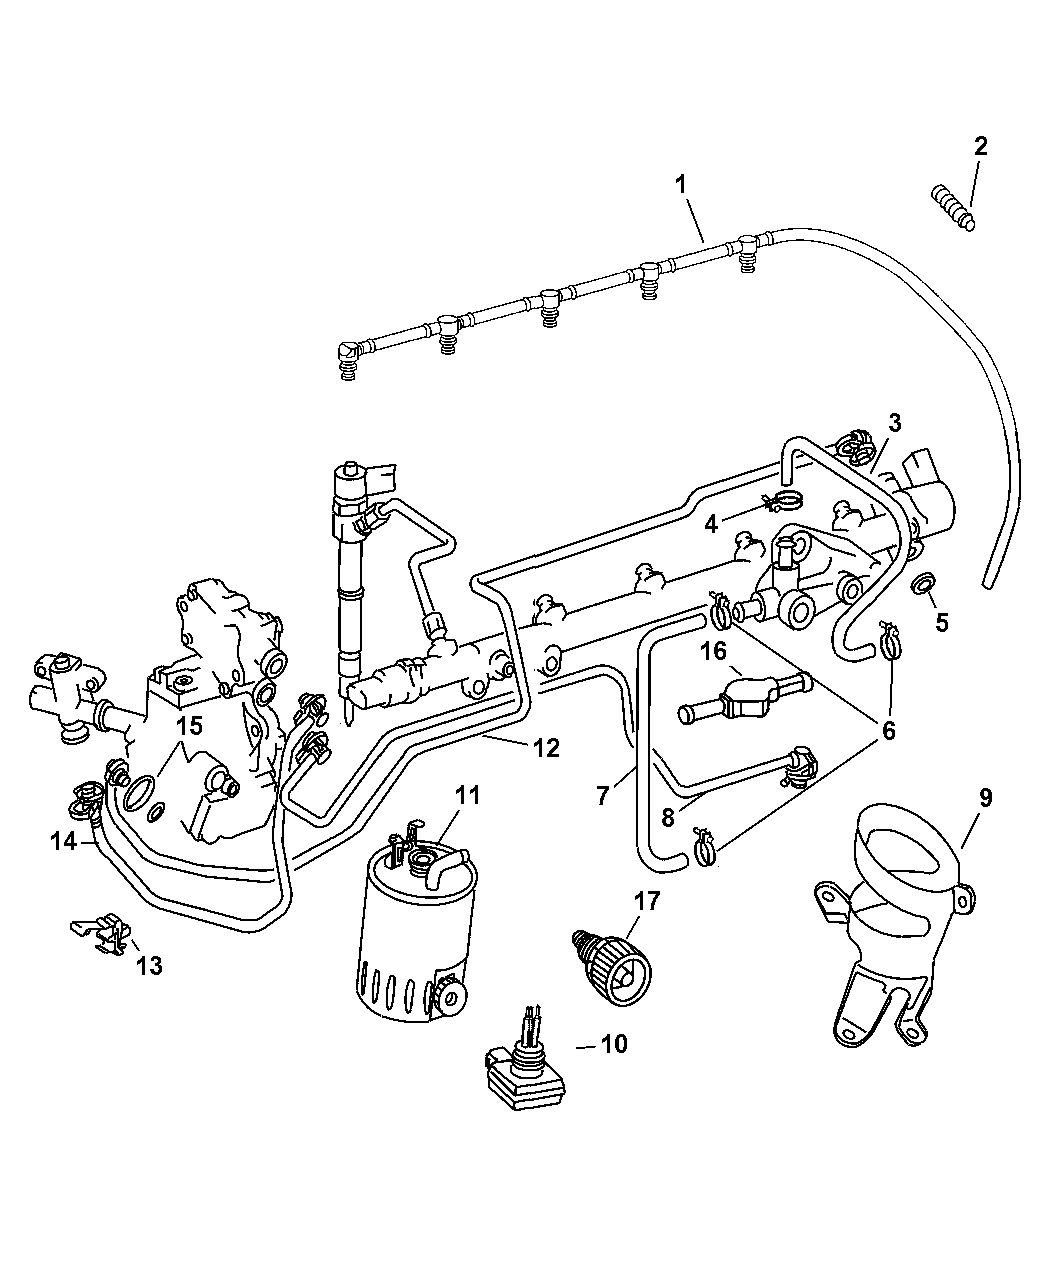 sprinter fuel system diagram best wiring library rh 115 princestaash org